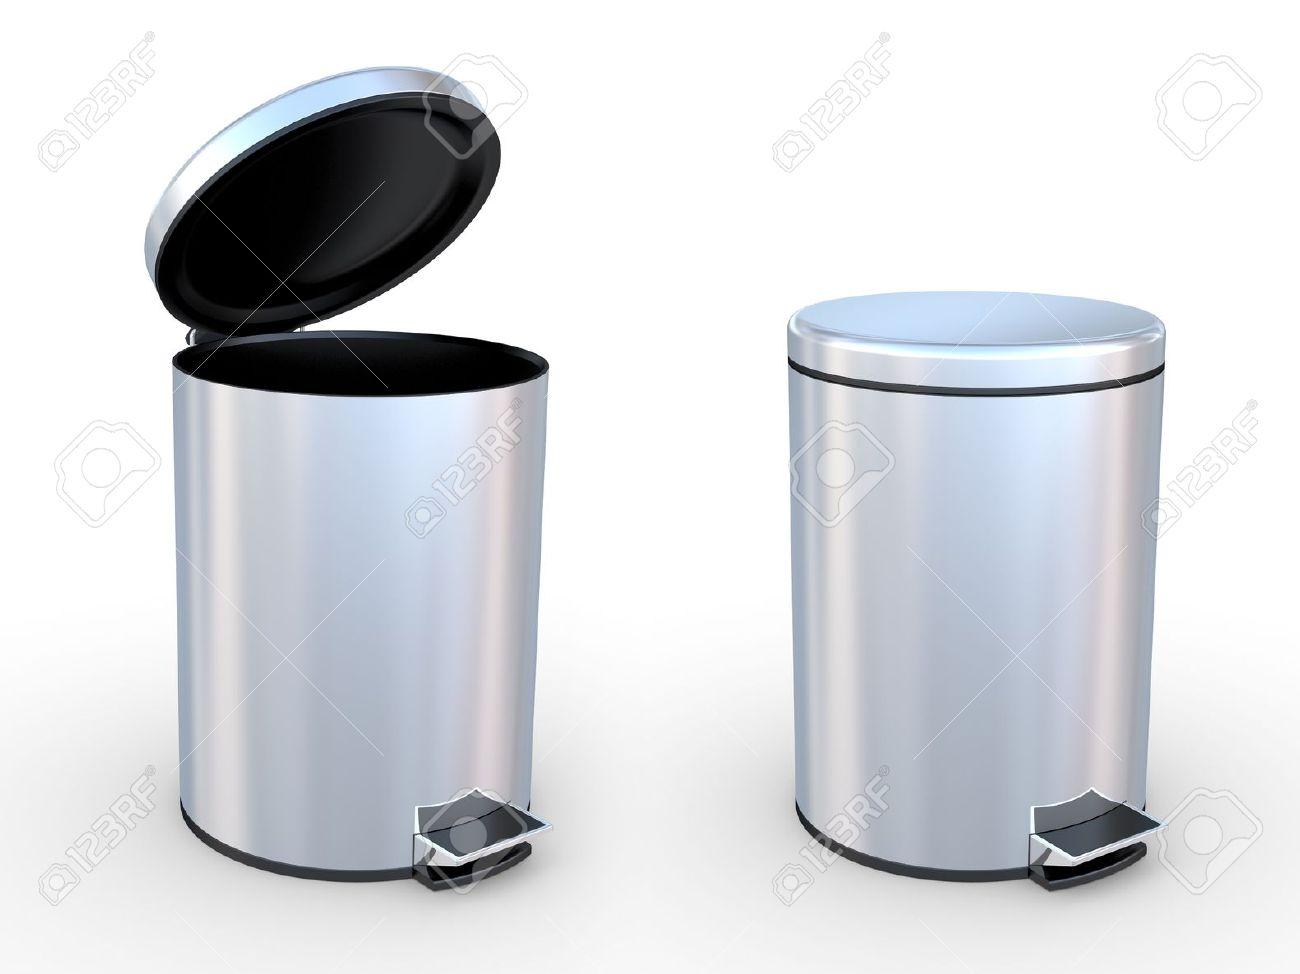 modern refuse bin on a white background stock photo picture and  - modern refuse bin on a white background stock photo